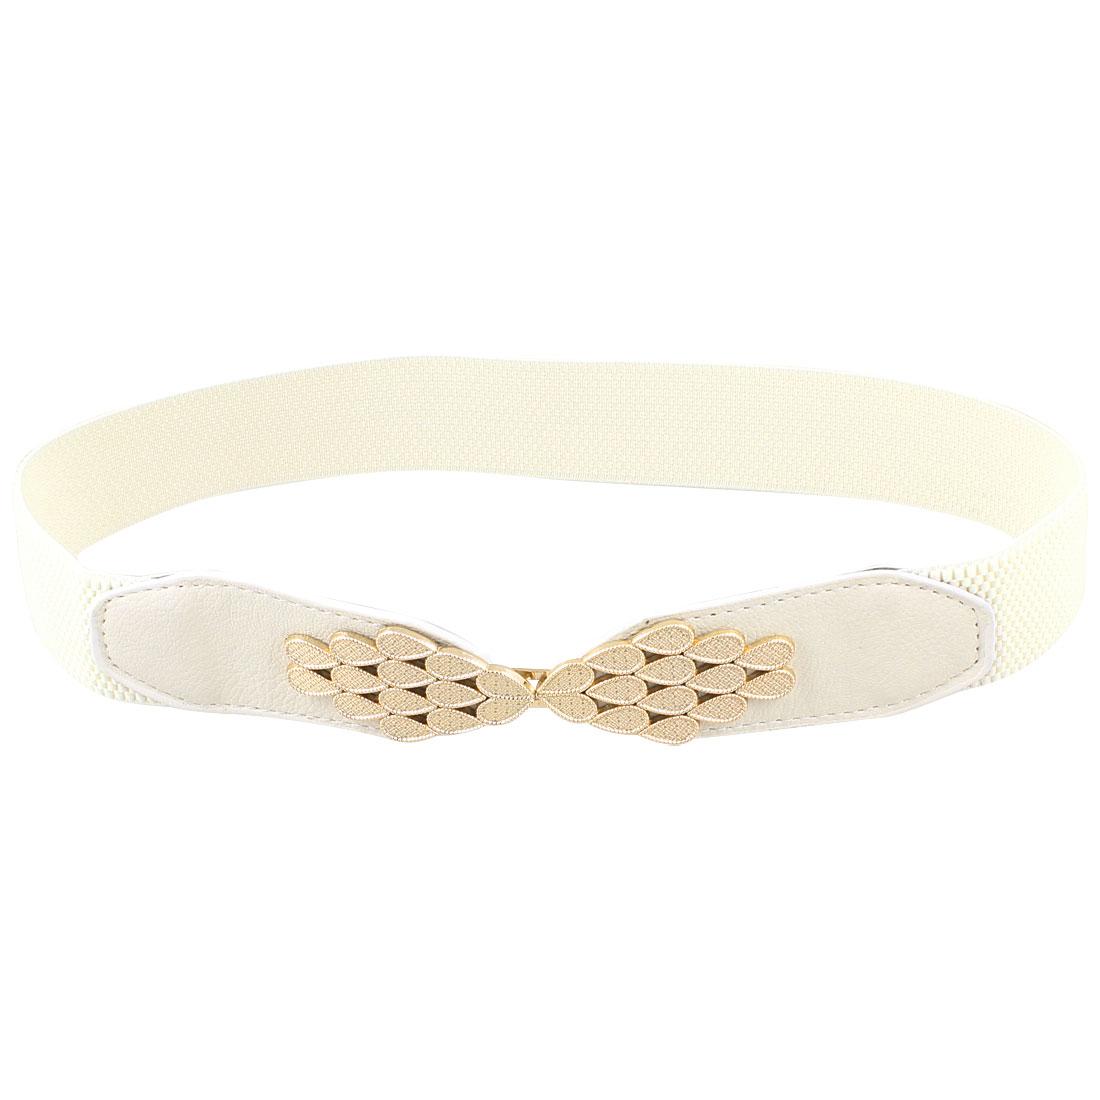 Lady Women Waterdrop Adorning Interlocking Buckle Stretchy Waist Belt White